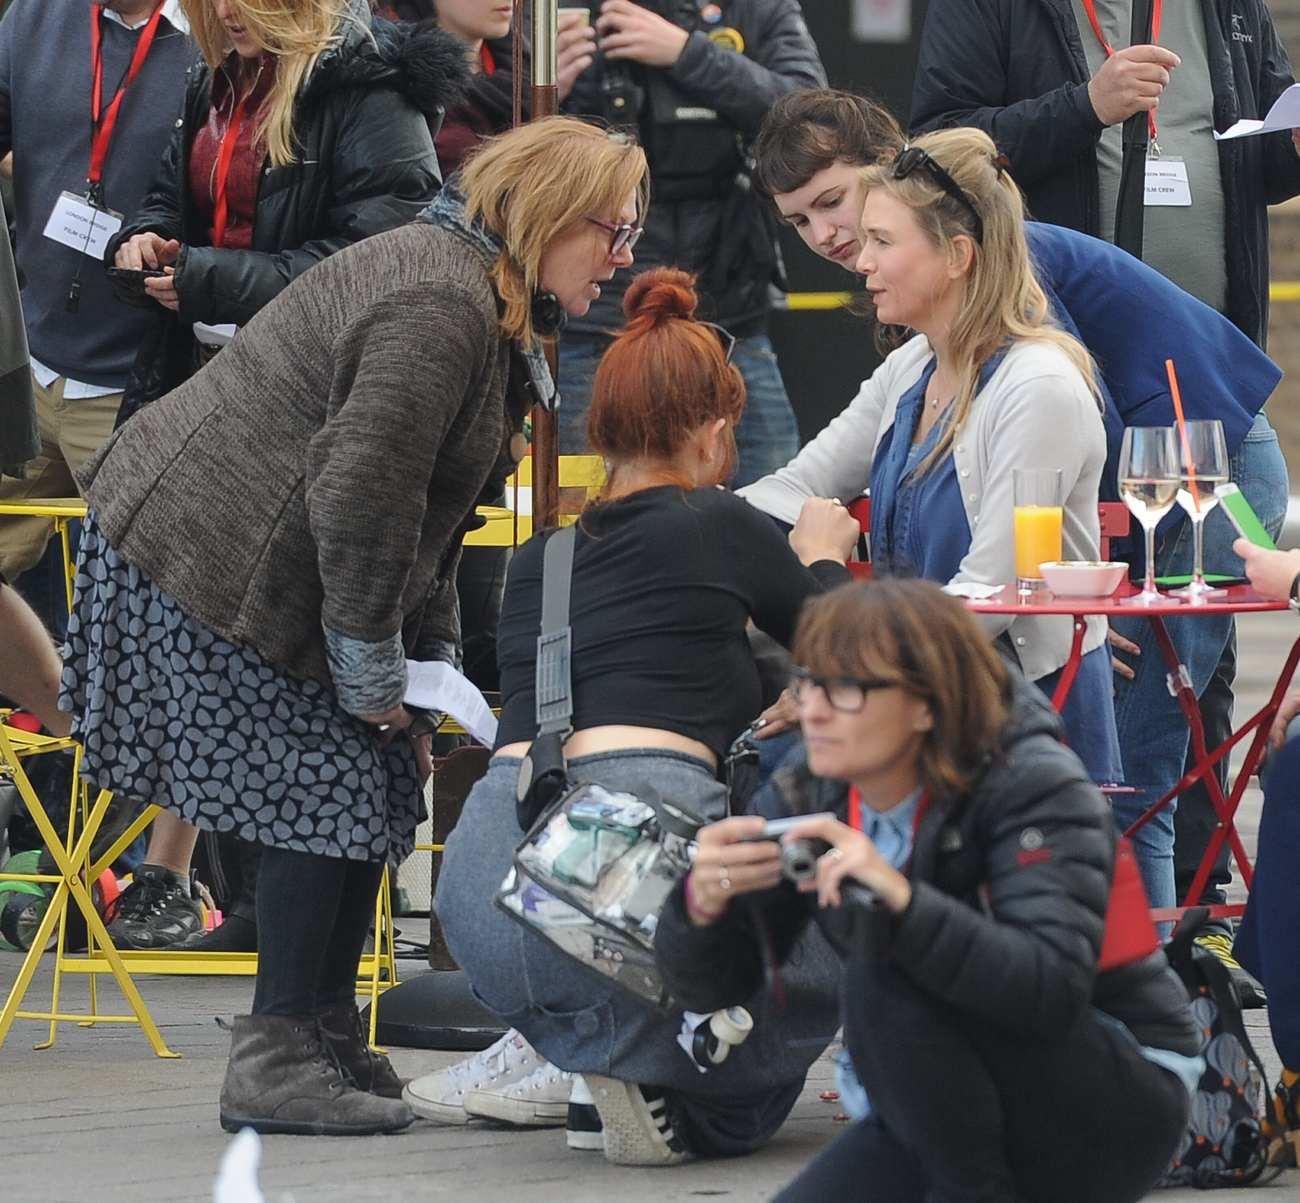 Renee Zellweger Filming Bridget Jones Movie in Kings Cross